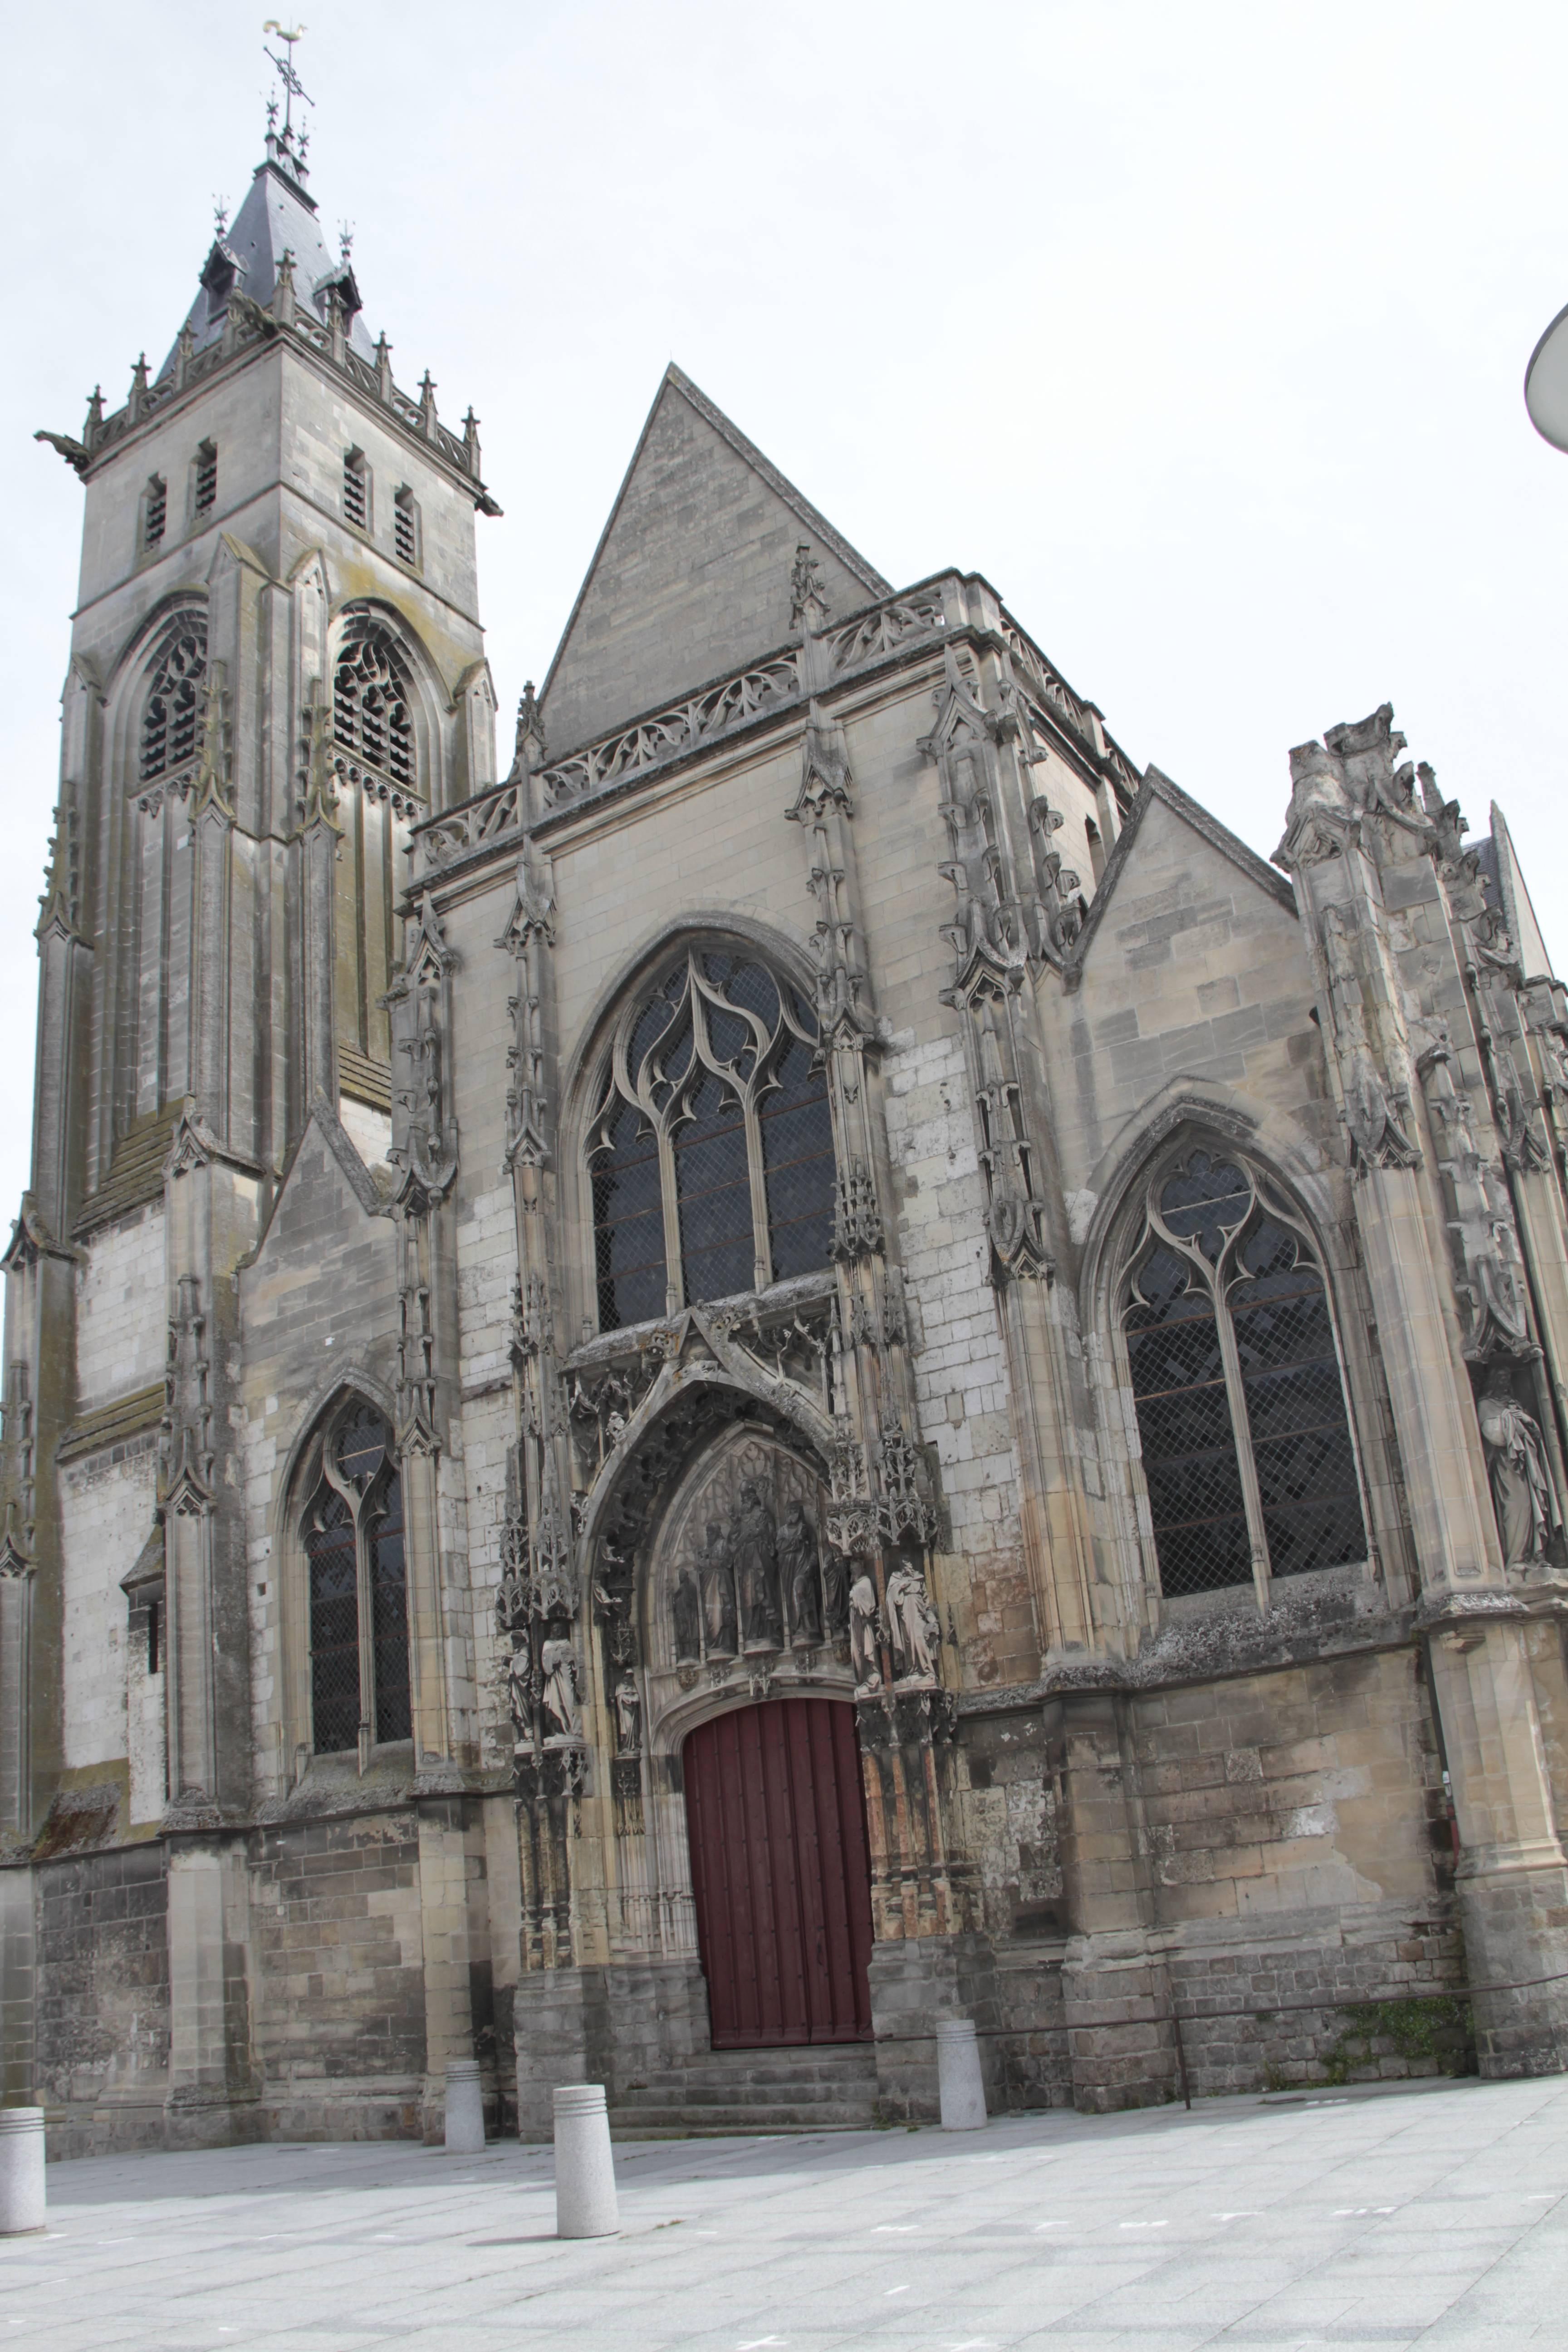 Baie de Somme mai 2015_0029 Amiens Eglise St Germain